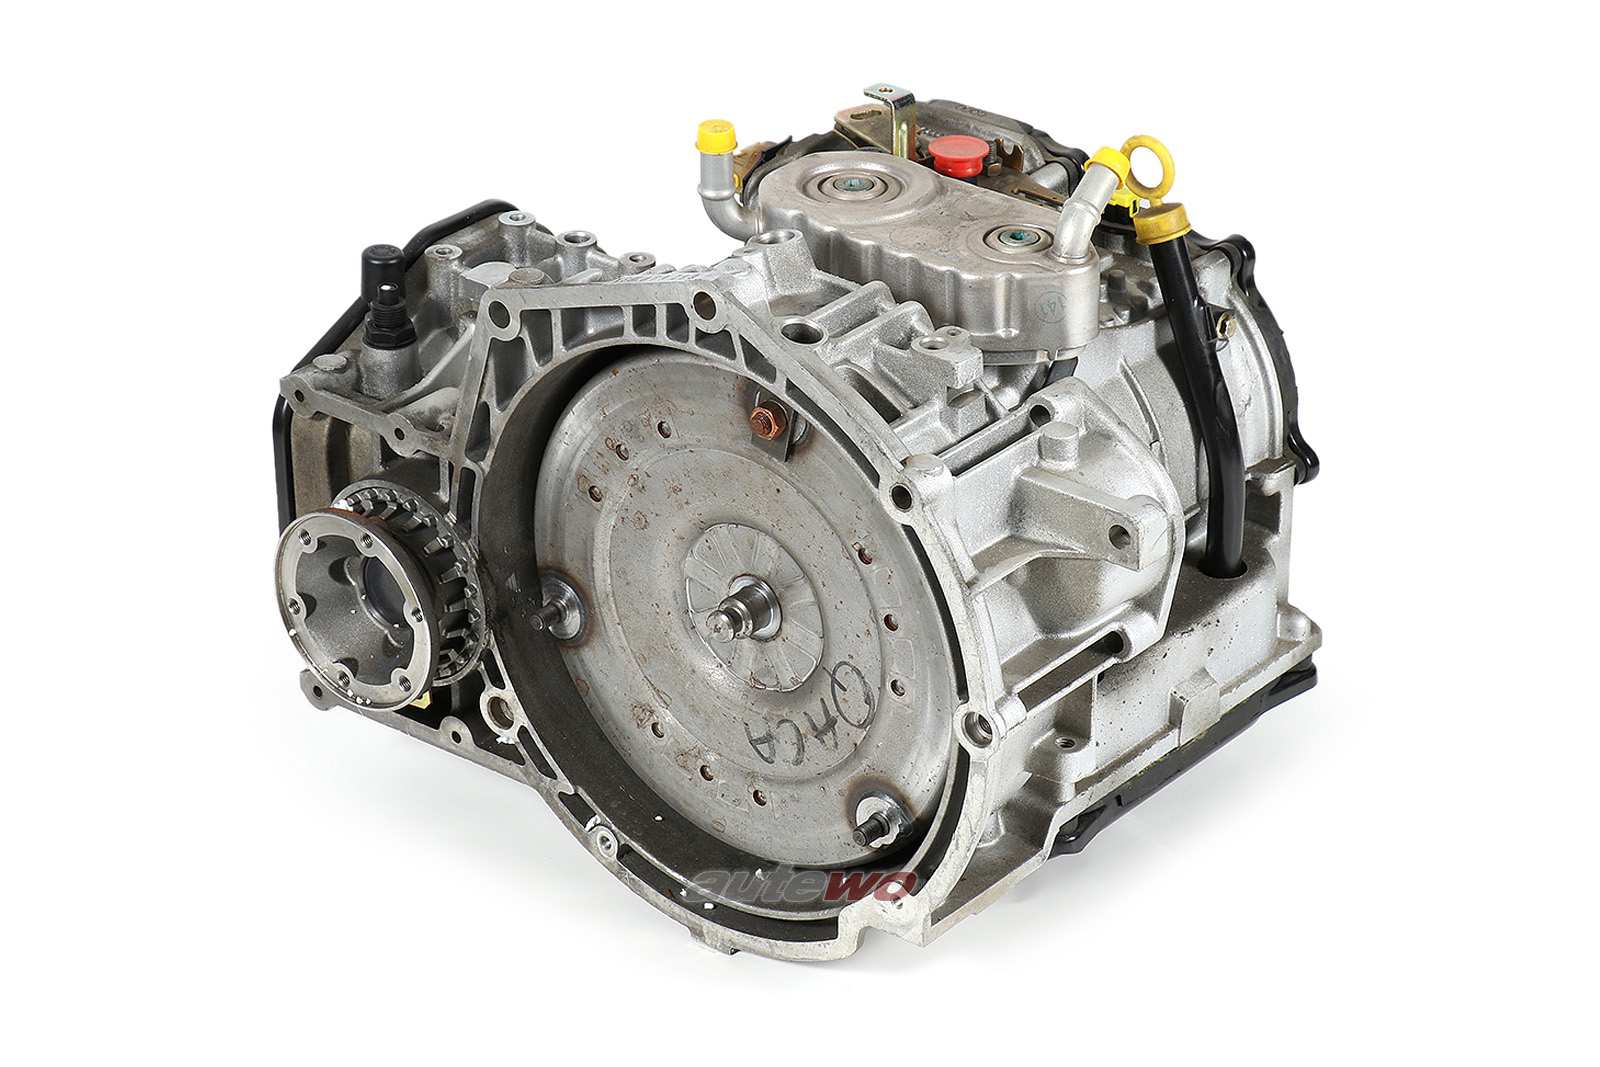 096300035KX NEU VW Corrado/Golf 3/Passat B3 2.0l 16V Automatikgetriebe CBZ 090703X